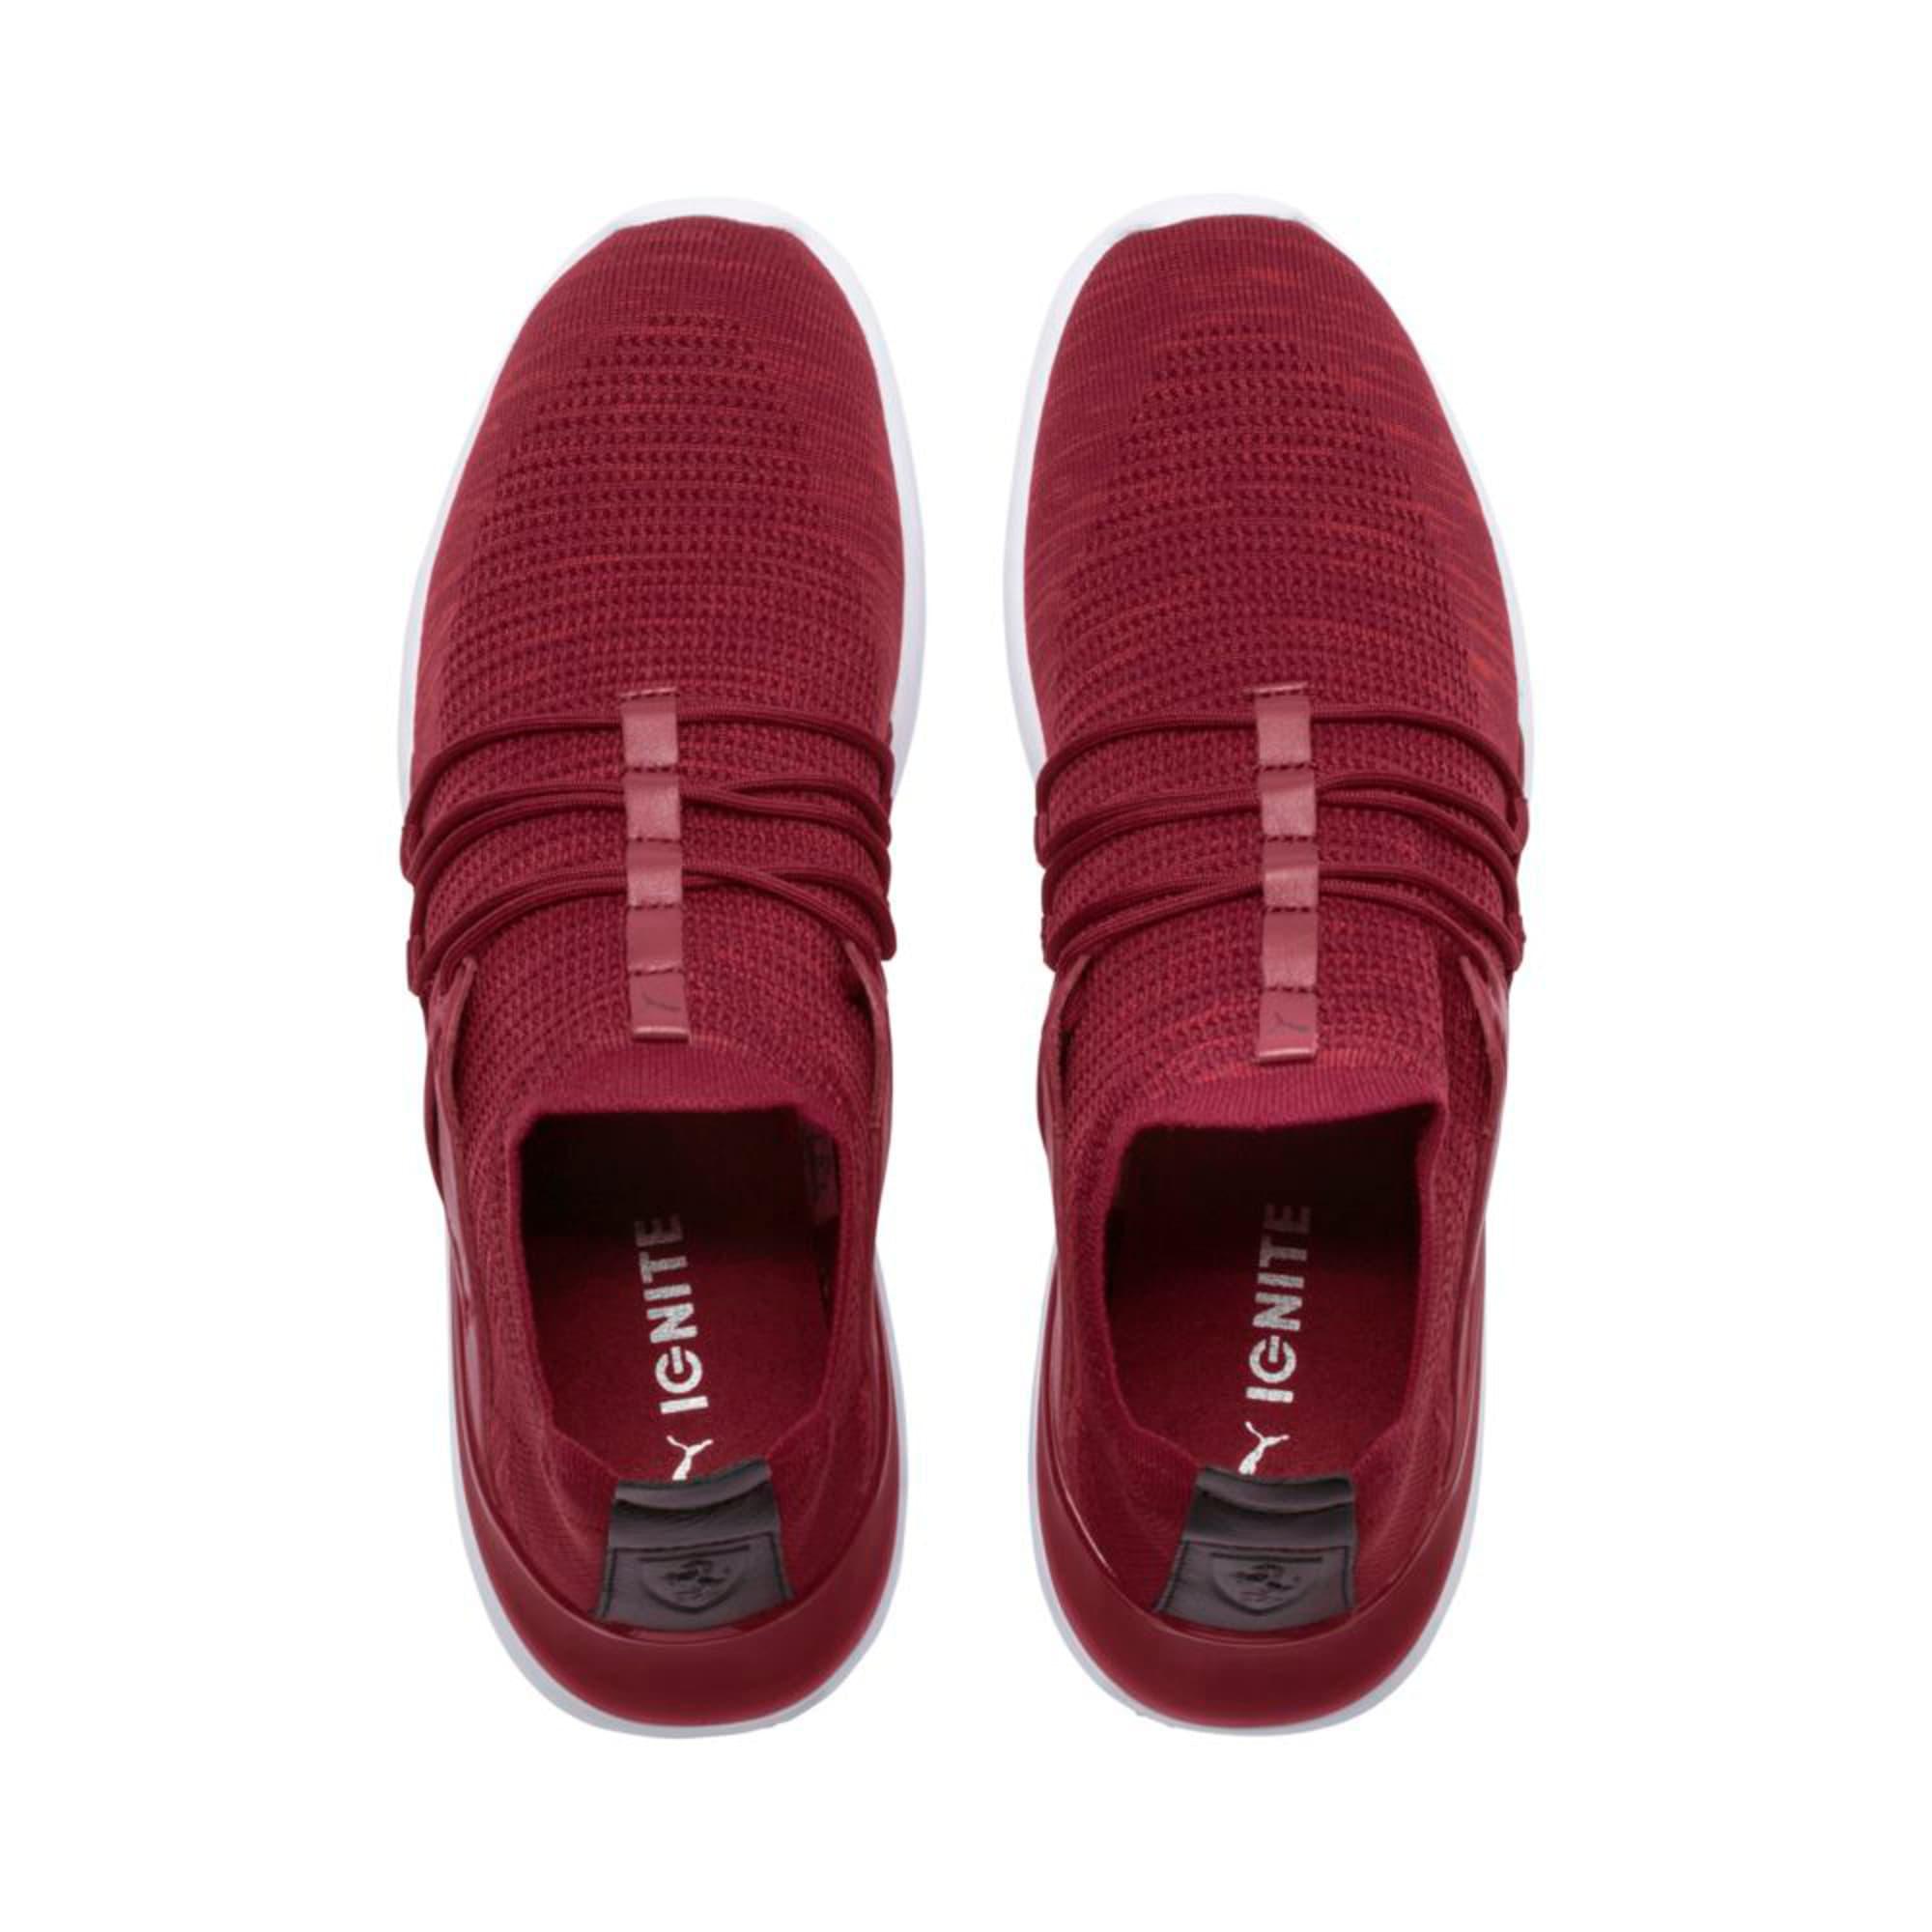 Thumbnail 3 of Ferrari Evo Cat Lace Lifestyle Shoes, Pomegranate-Bossa Nova-Wht, medium-IND